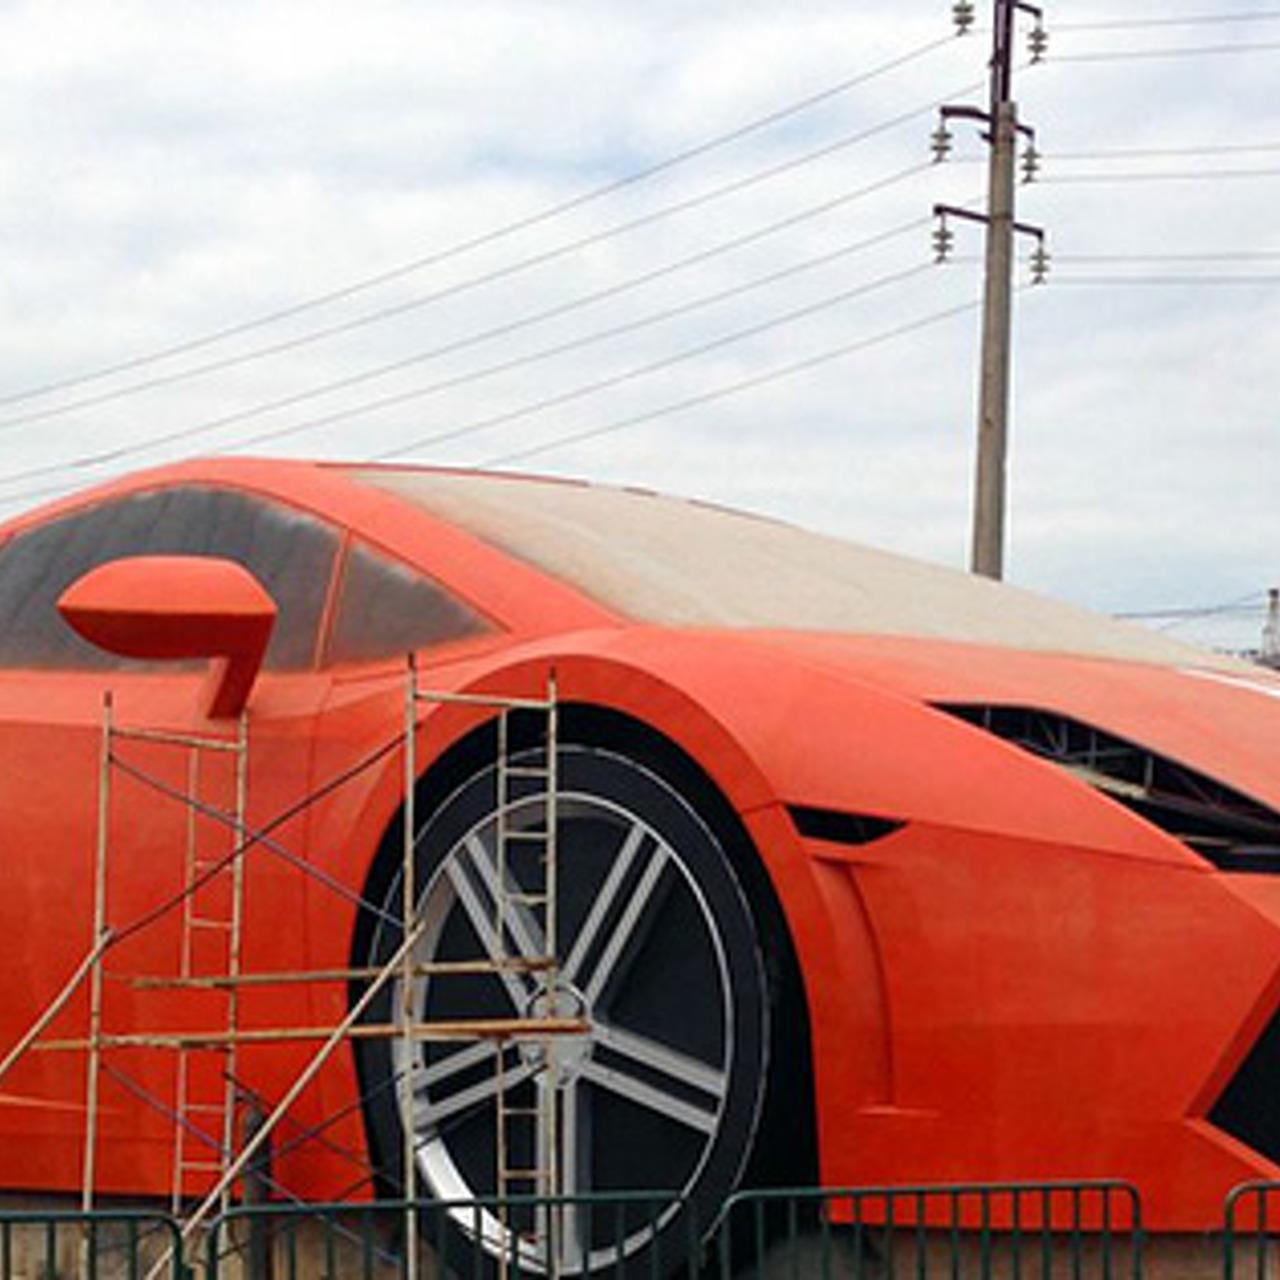 This Humongous Lamborghini Gallardo Statue Is an Extremely Odd Celebratory Gift